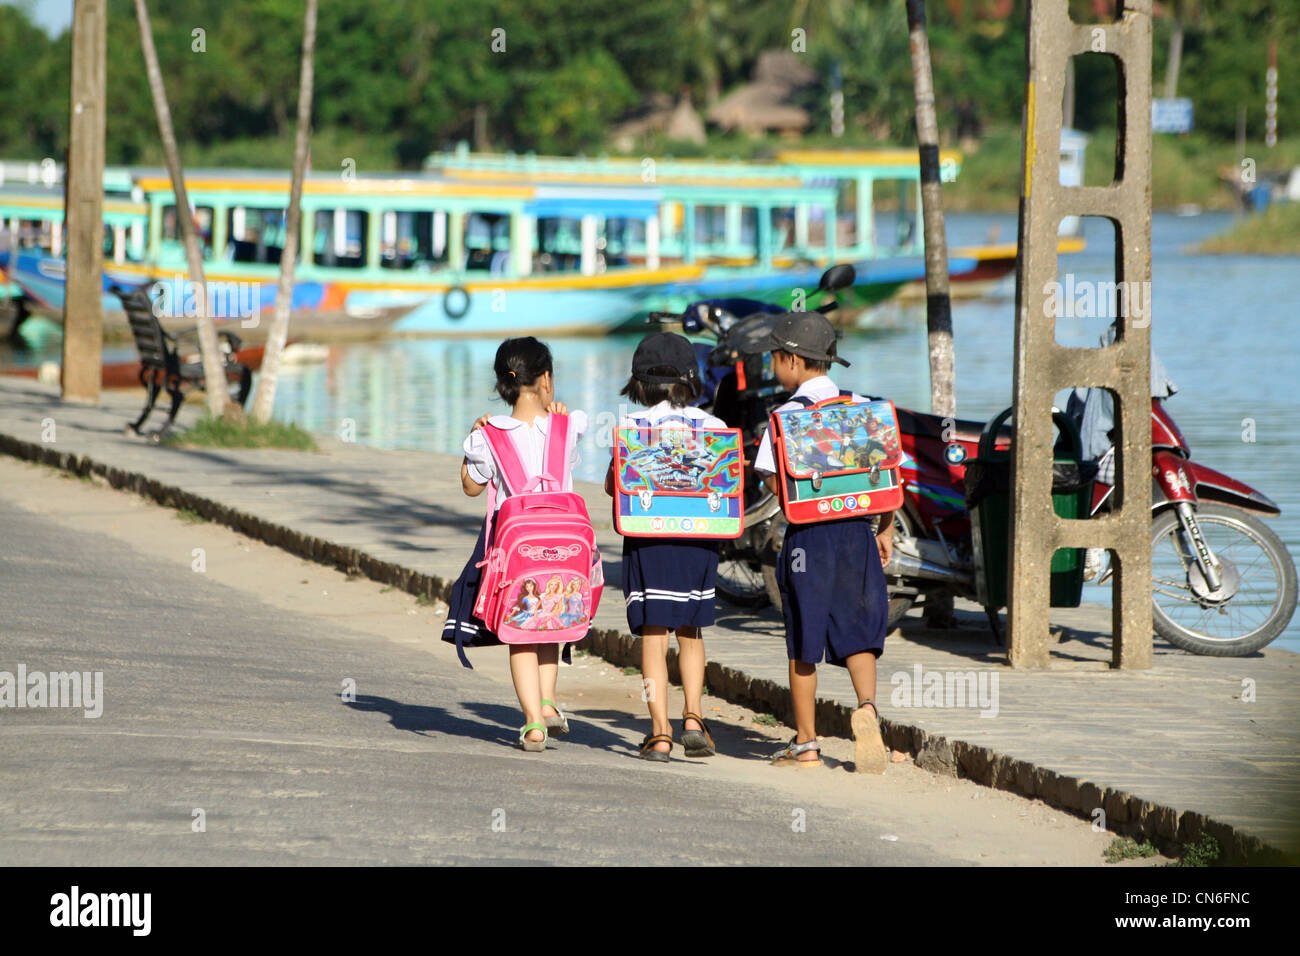 Vietnamese school children on their way home in Hoi An, Vietnam - Stock Image